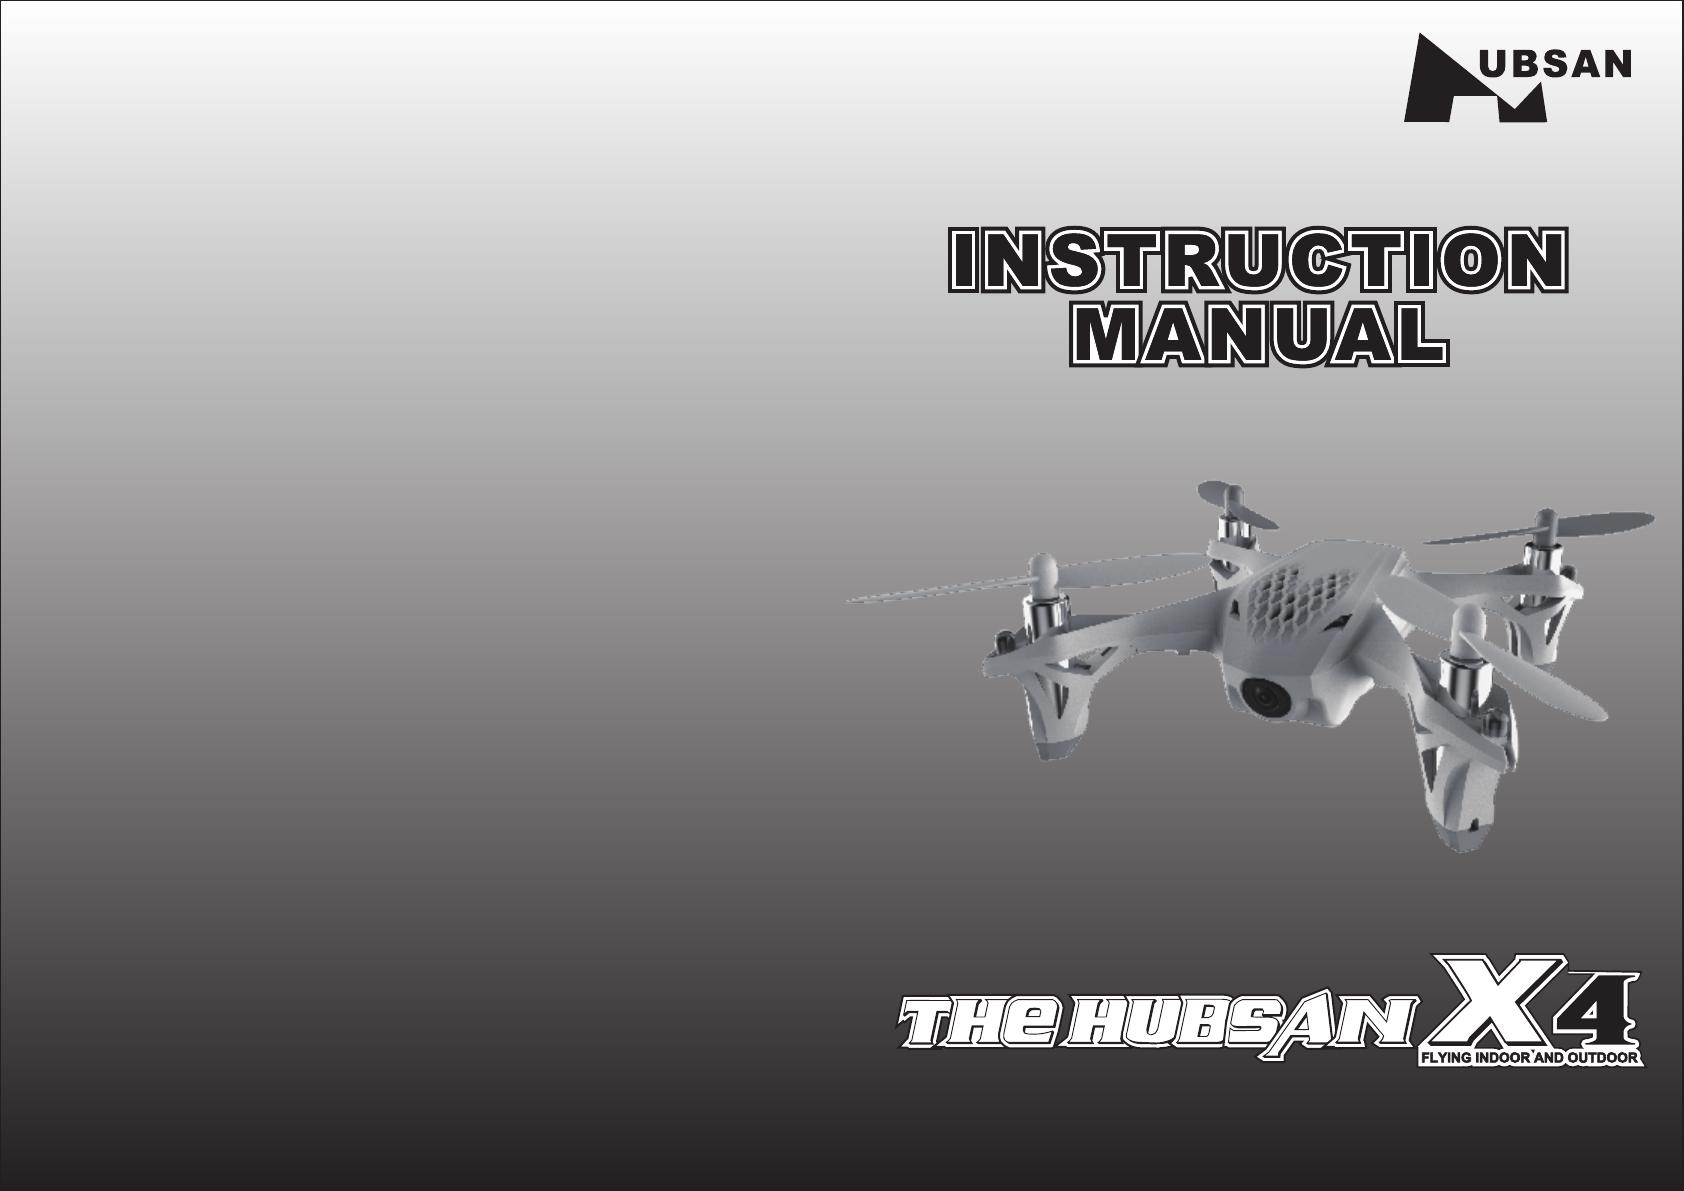 Hubsan Hbs H107dtx Transmitter User Manual H107 V2 20120905 Wiring Diagram